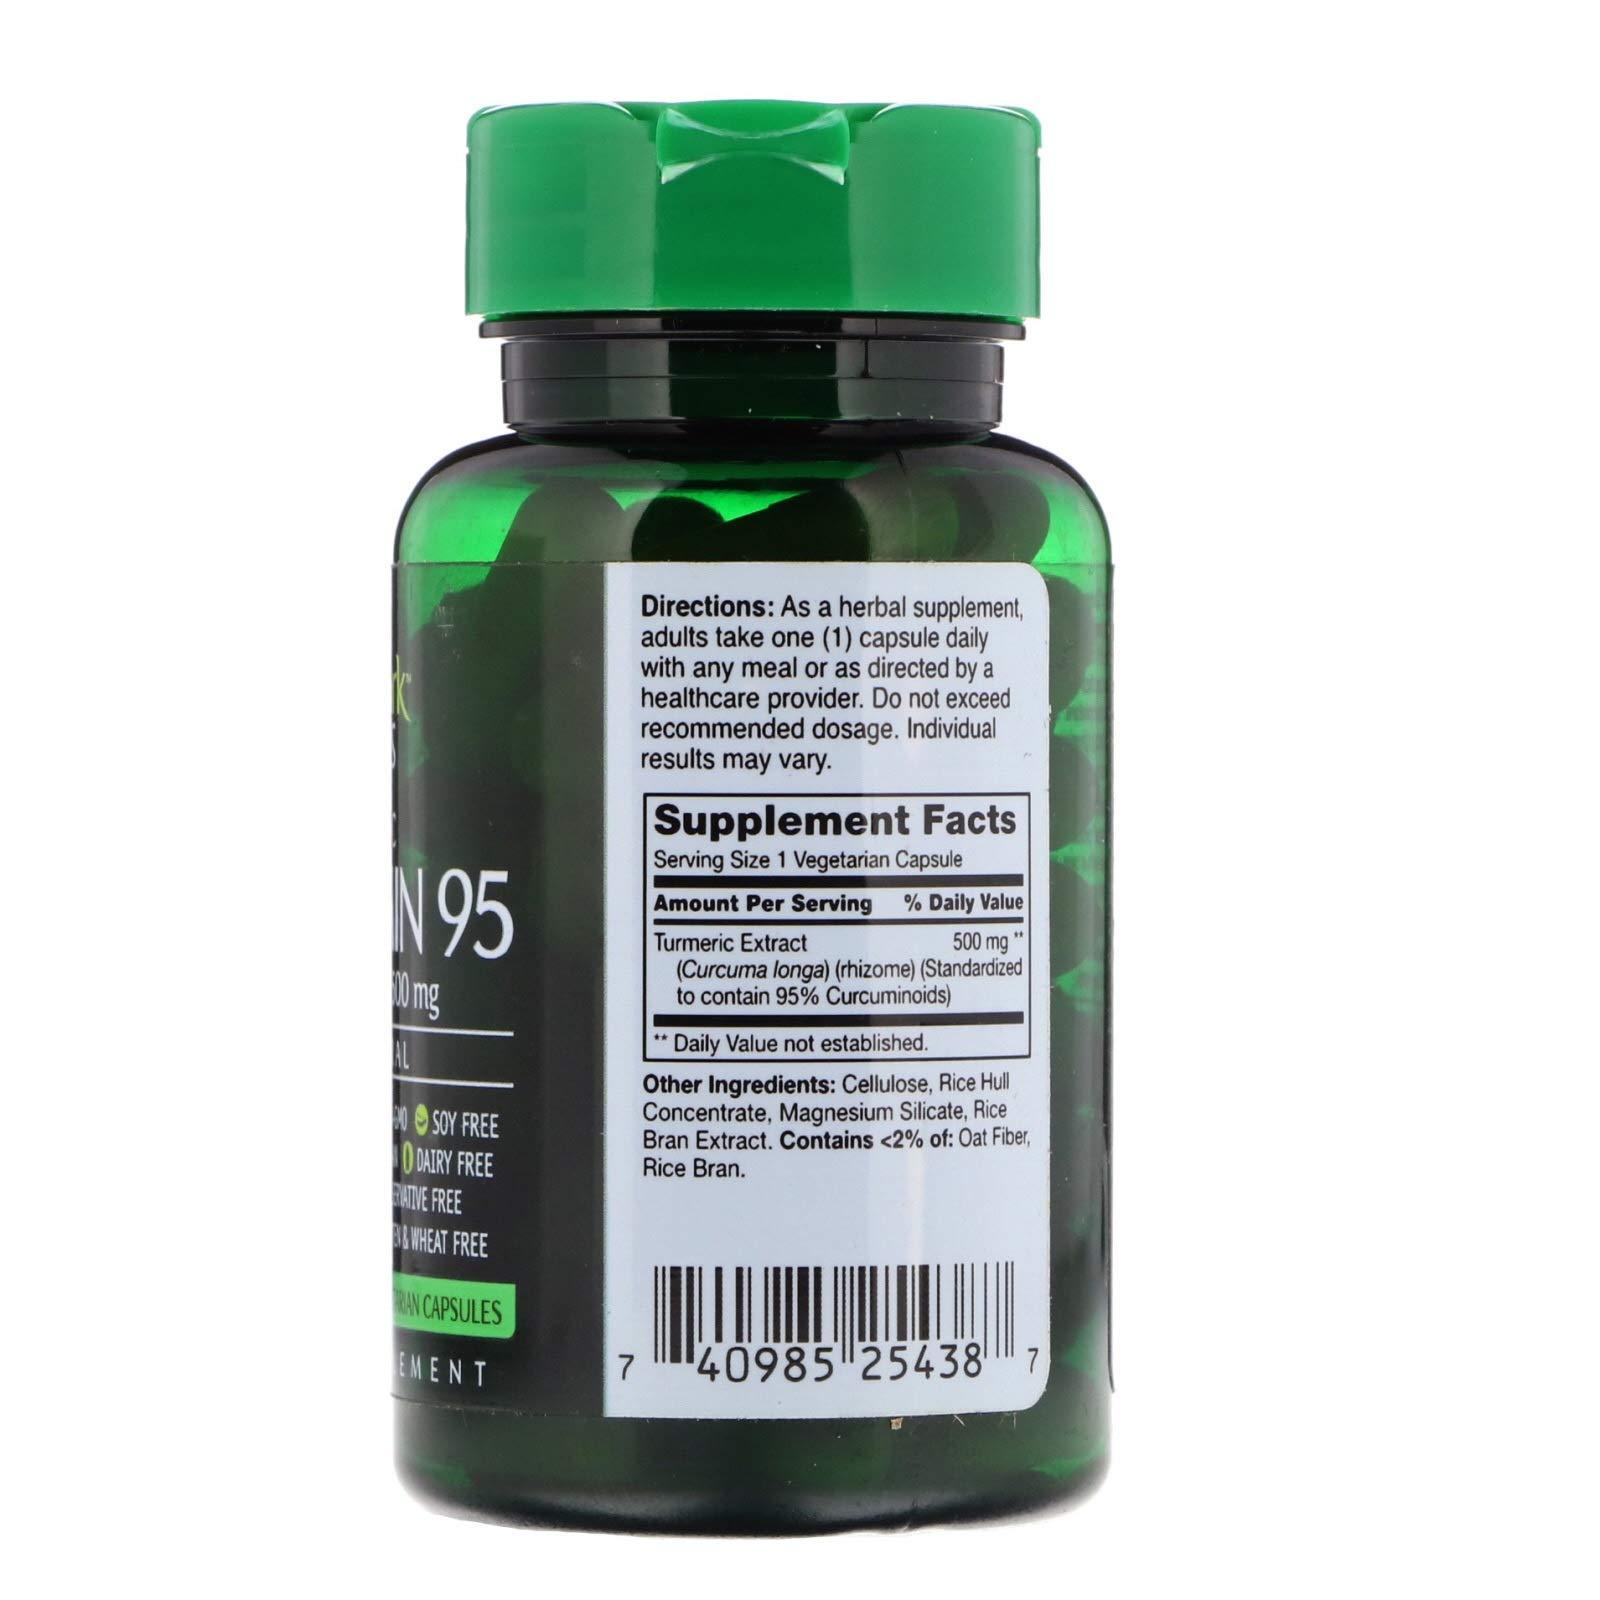 Puremark Naturals Turmeric Curcumin 95, 500mg, 60 Capsules Per Bottle (Pack of 9)